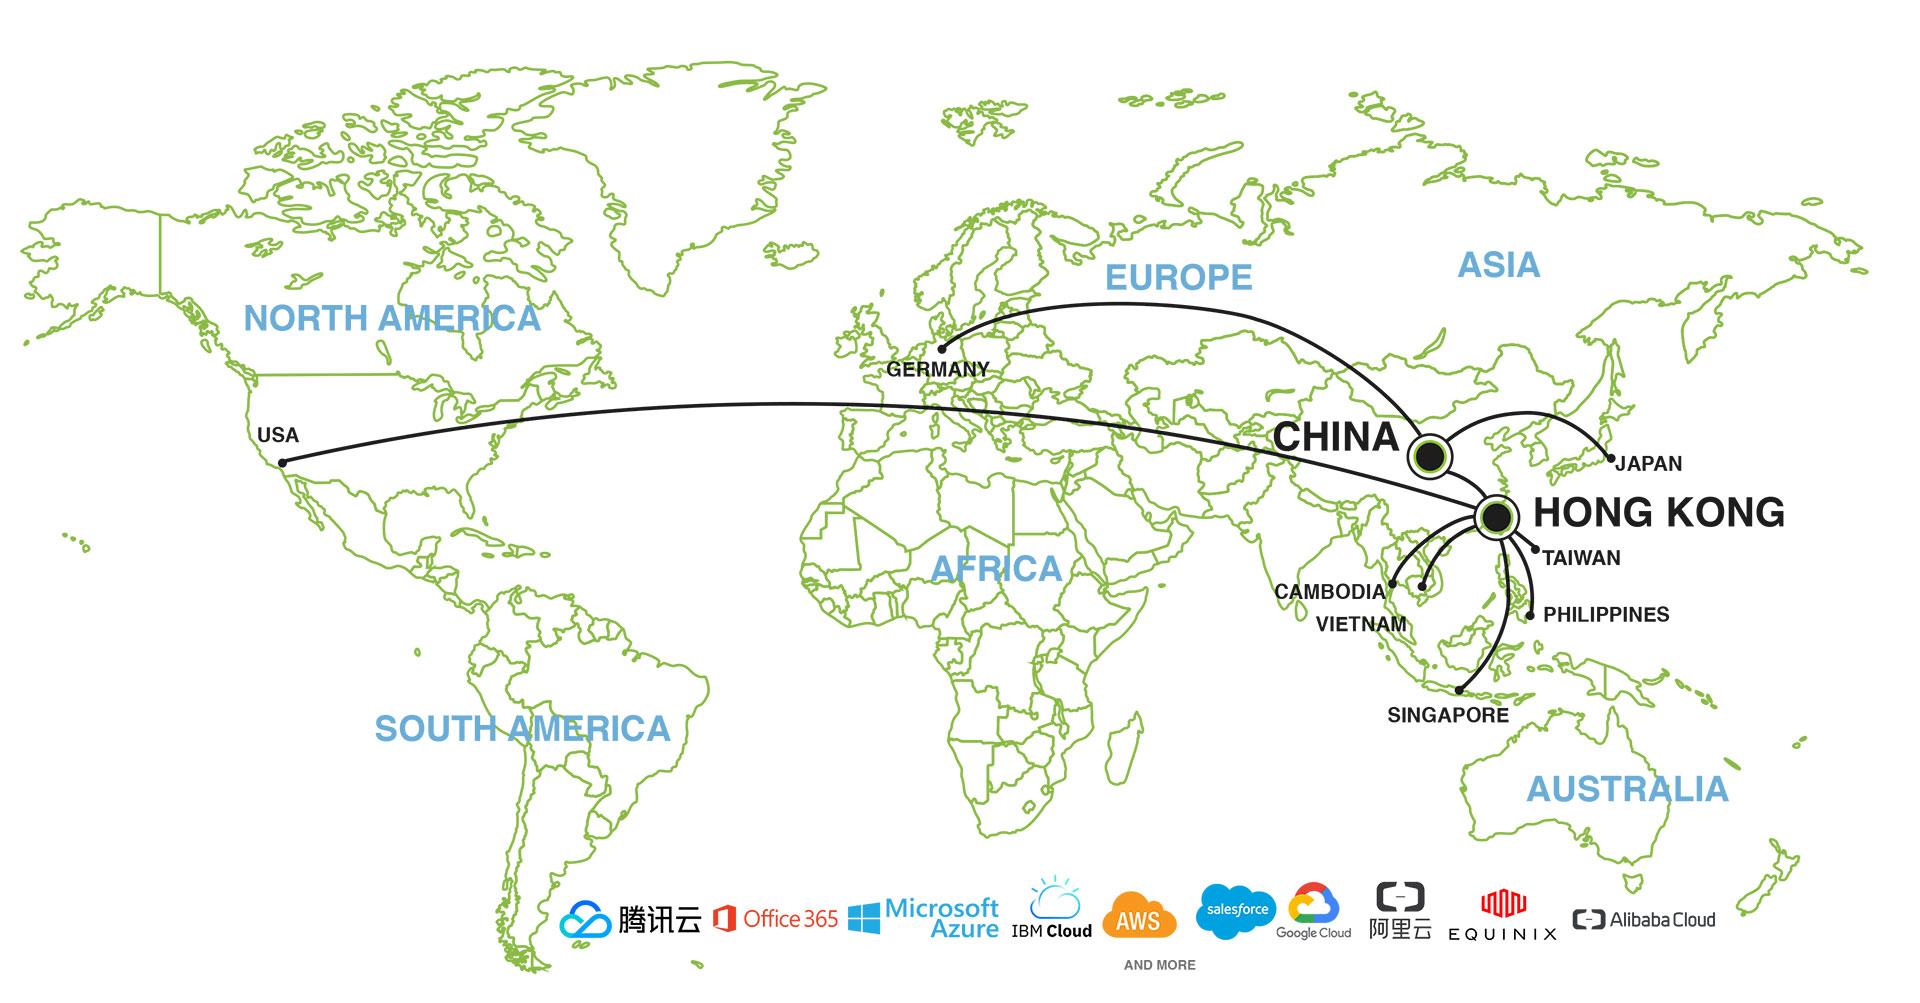 SD-WAN Network Worldwide Nodes | The borderless Connection worldwide